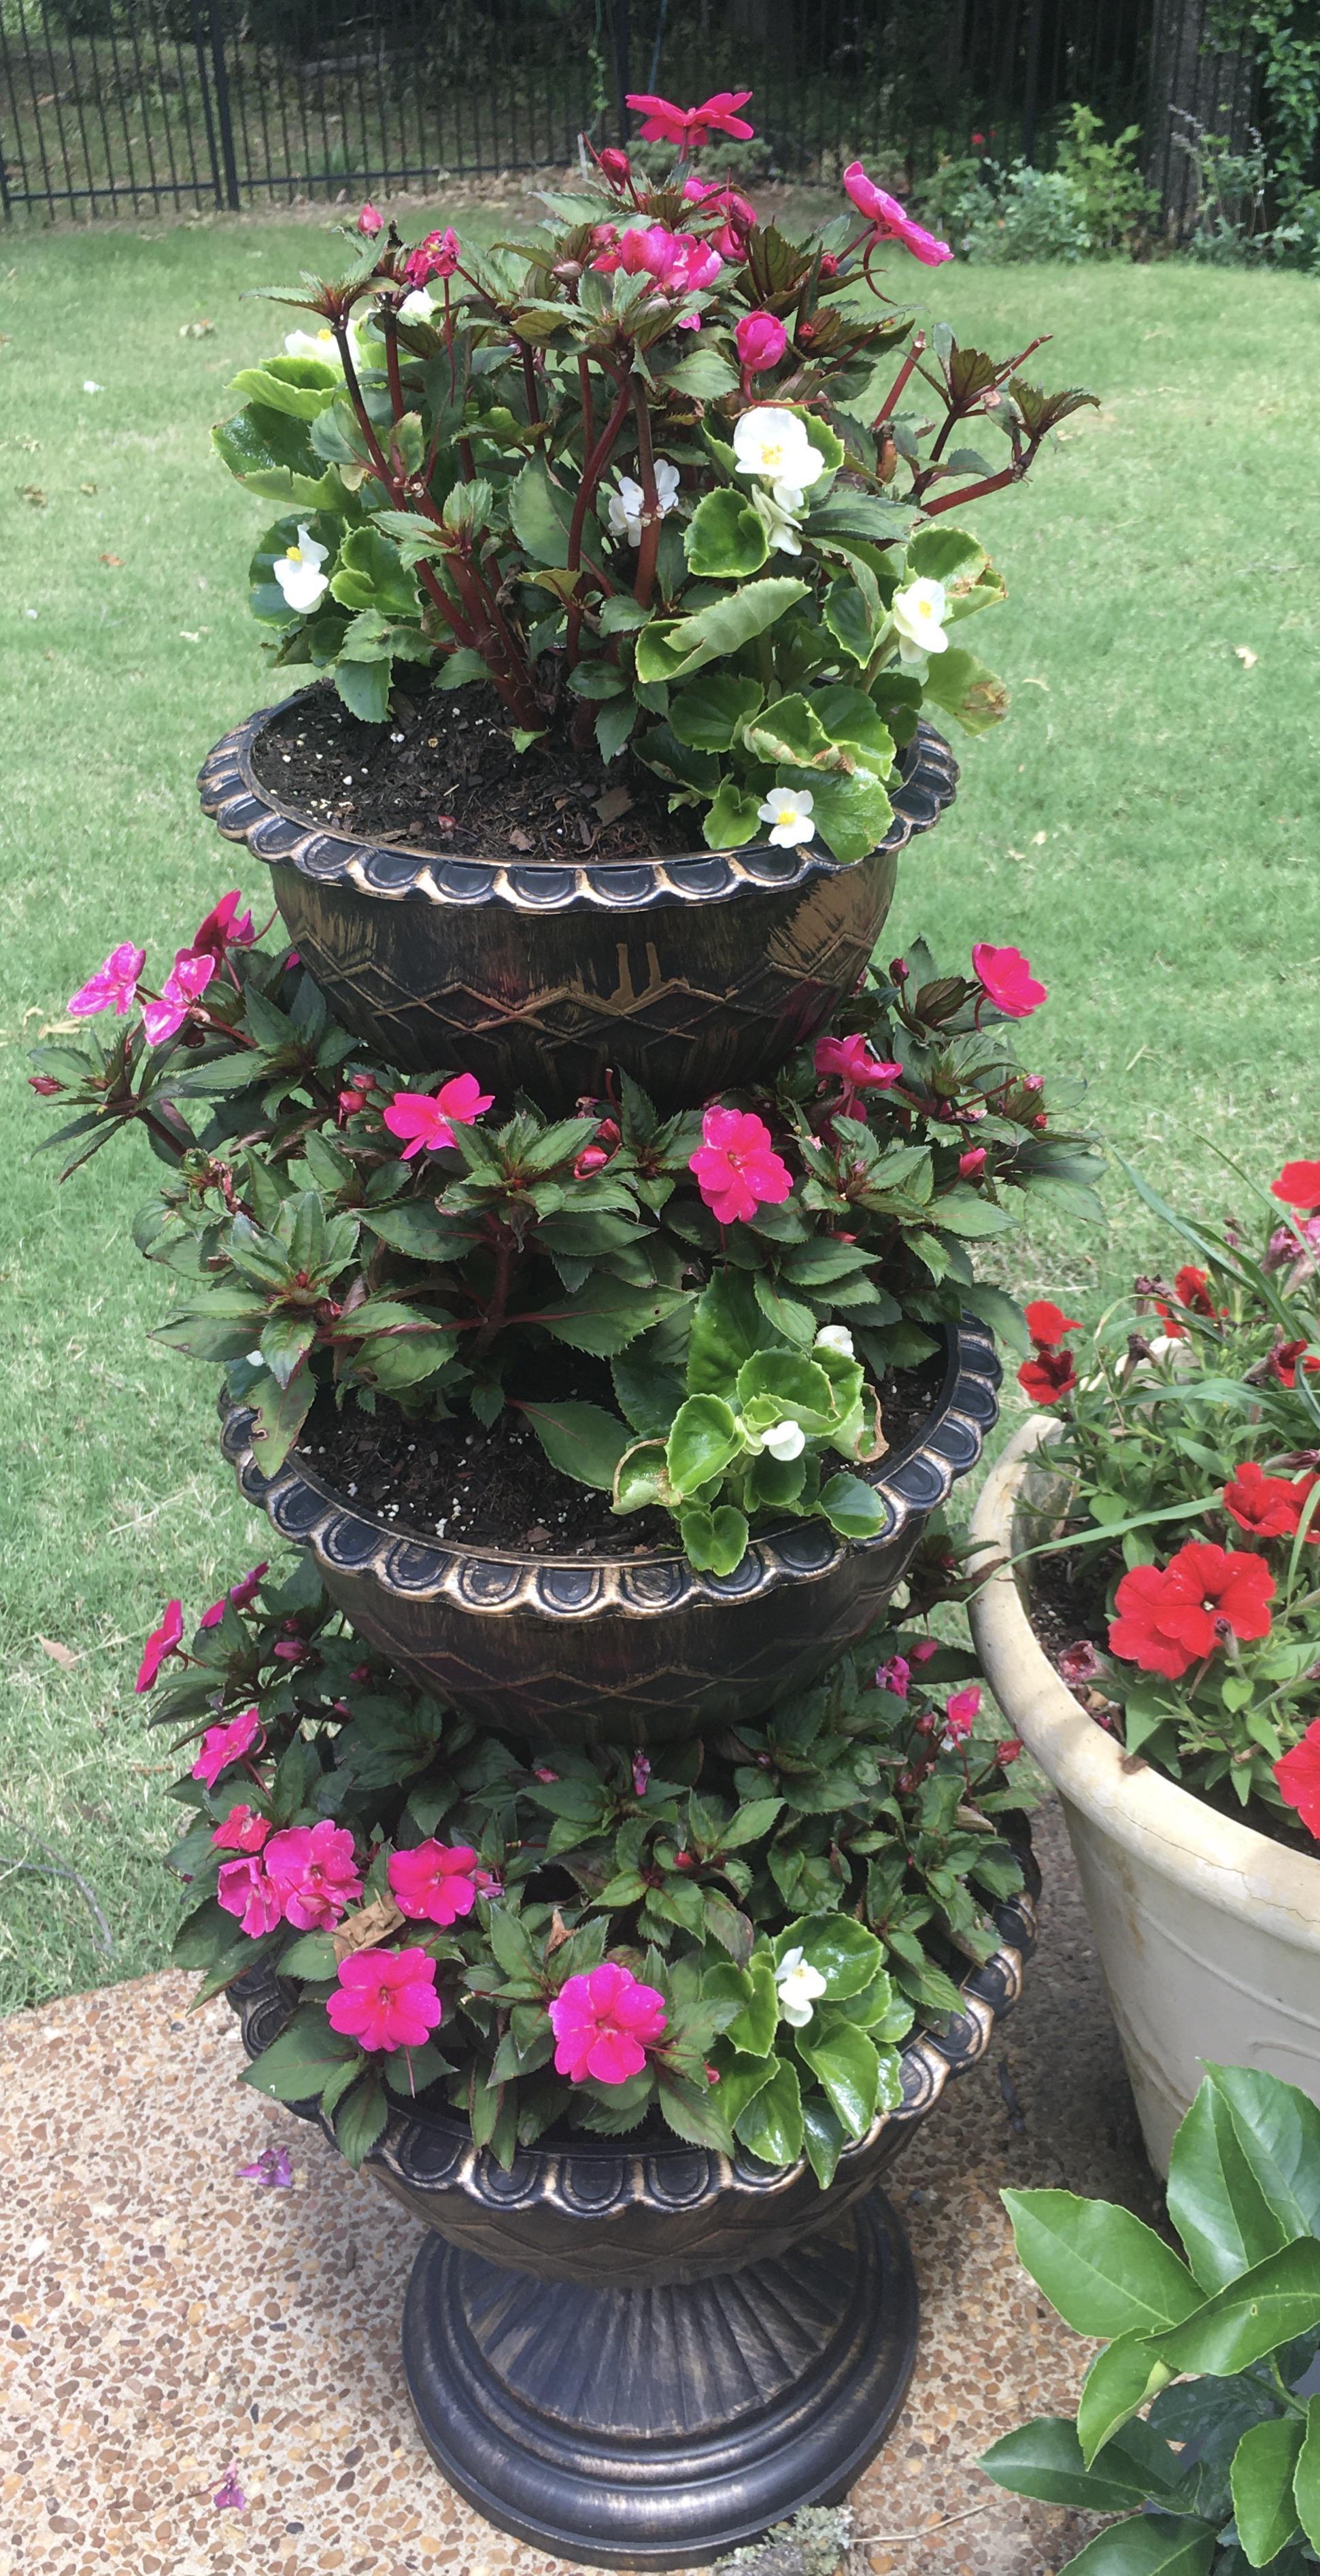 3 Tier Planter Aldi : planter, Three, Tiered, Planter, Looking, Pretty, Good.